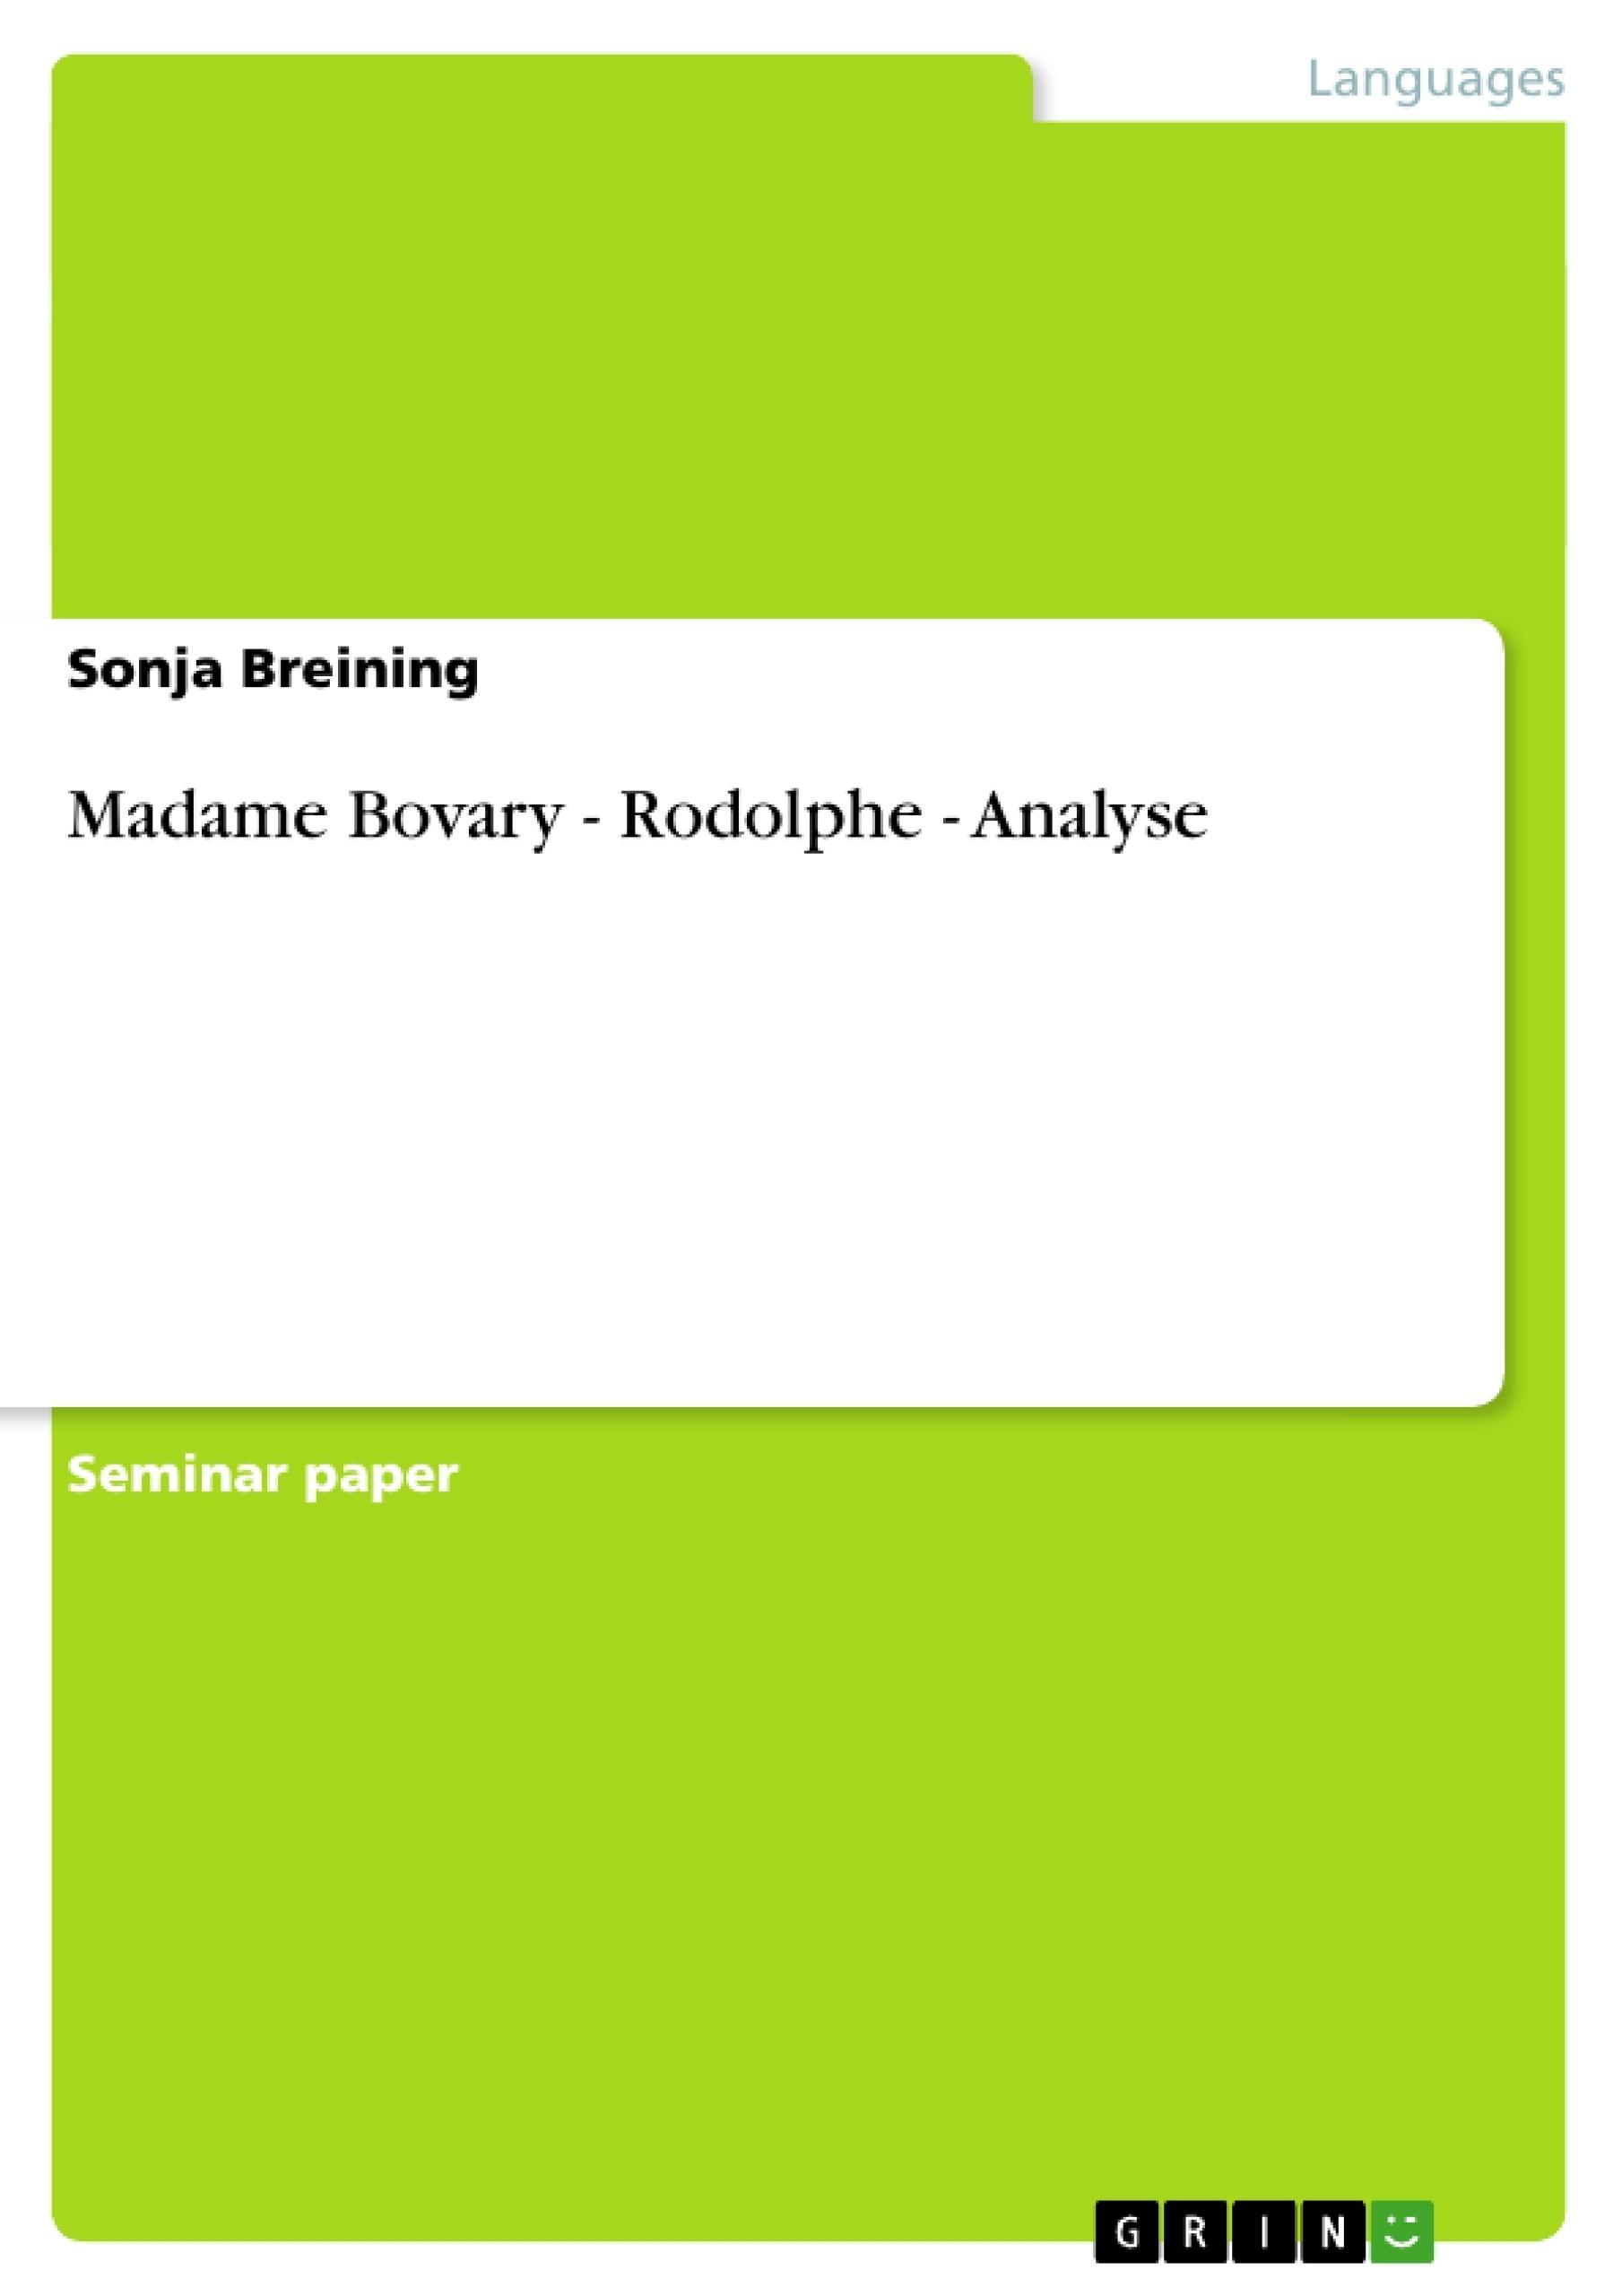 Titre: Madame Bovary - Rodolphe - Analyse